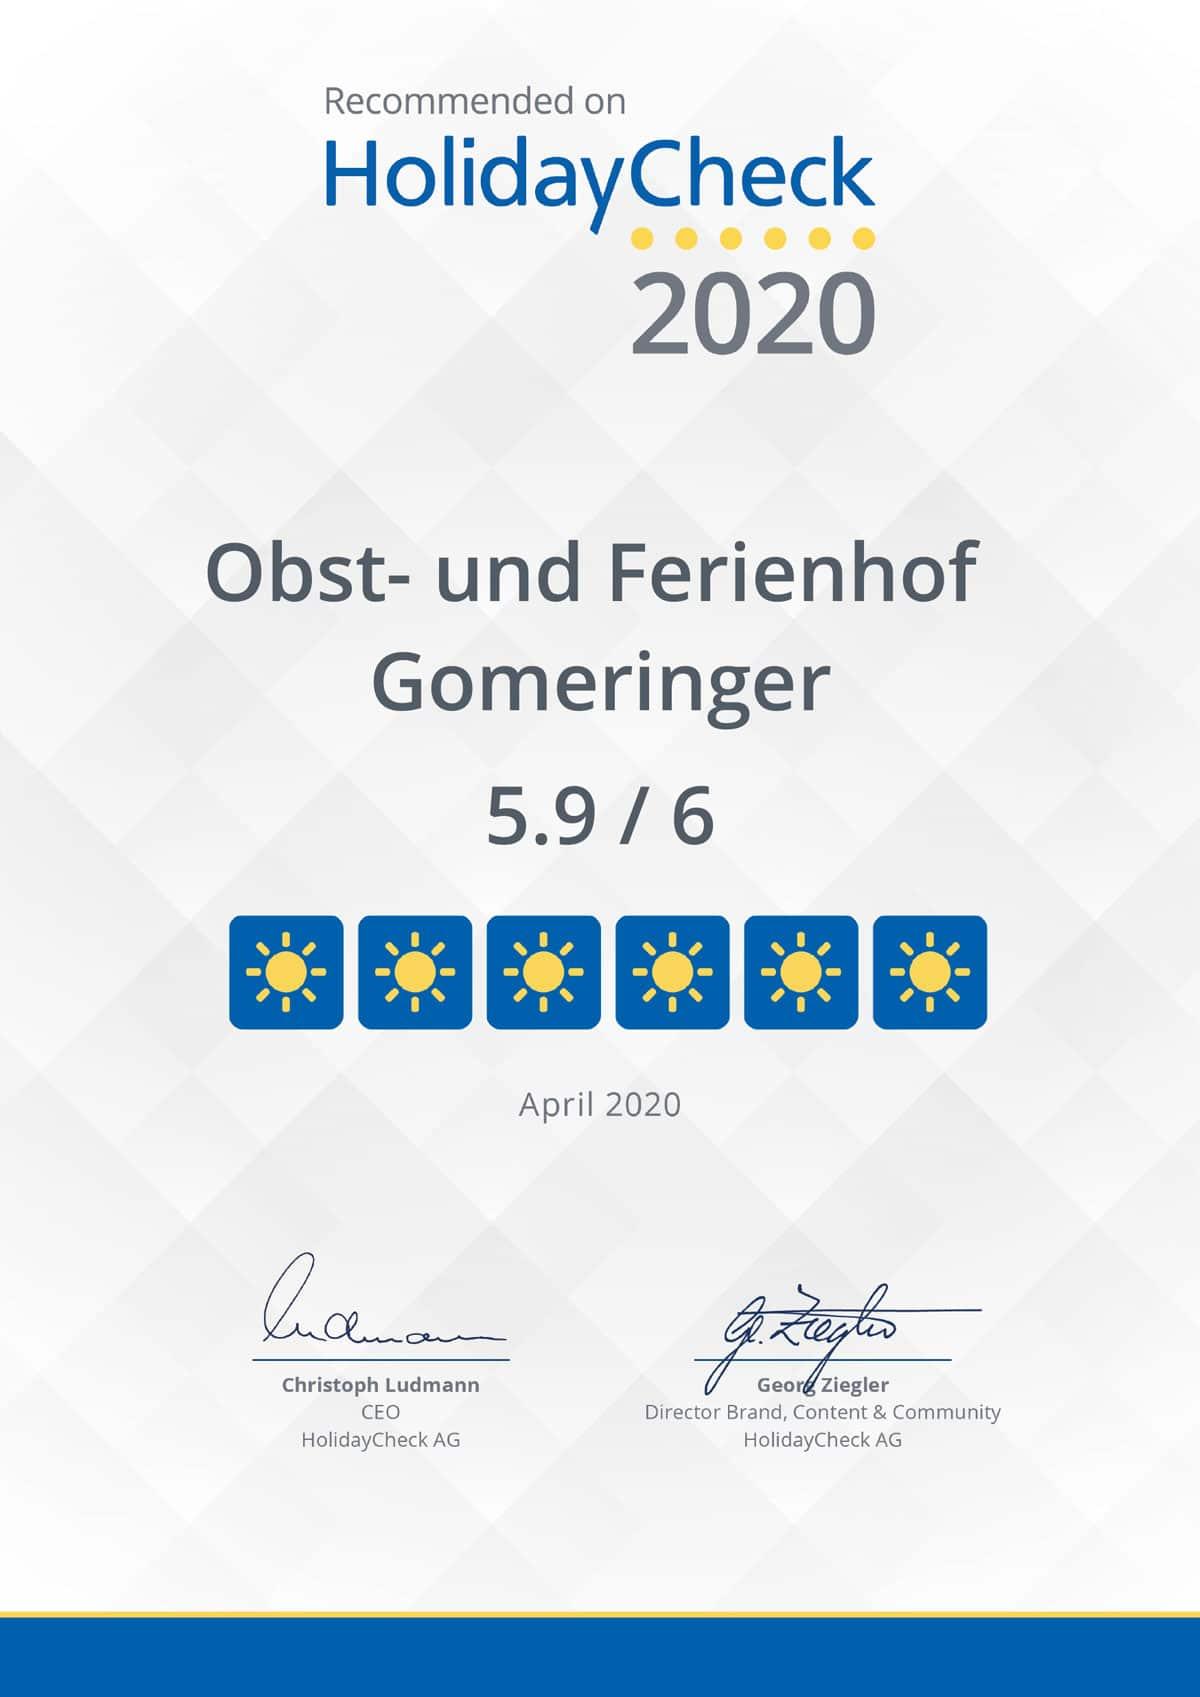 ferienhof-gomeringer-holidaycheck-urkunde-2020